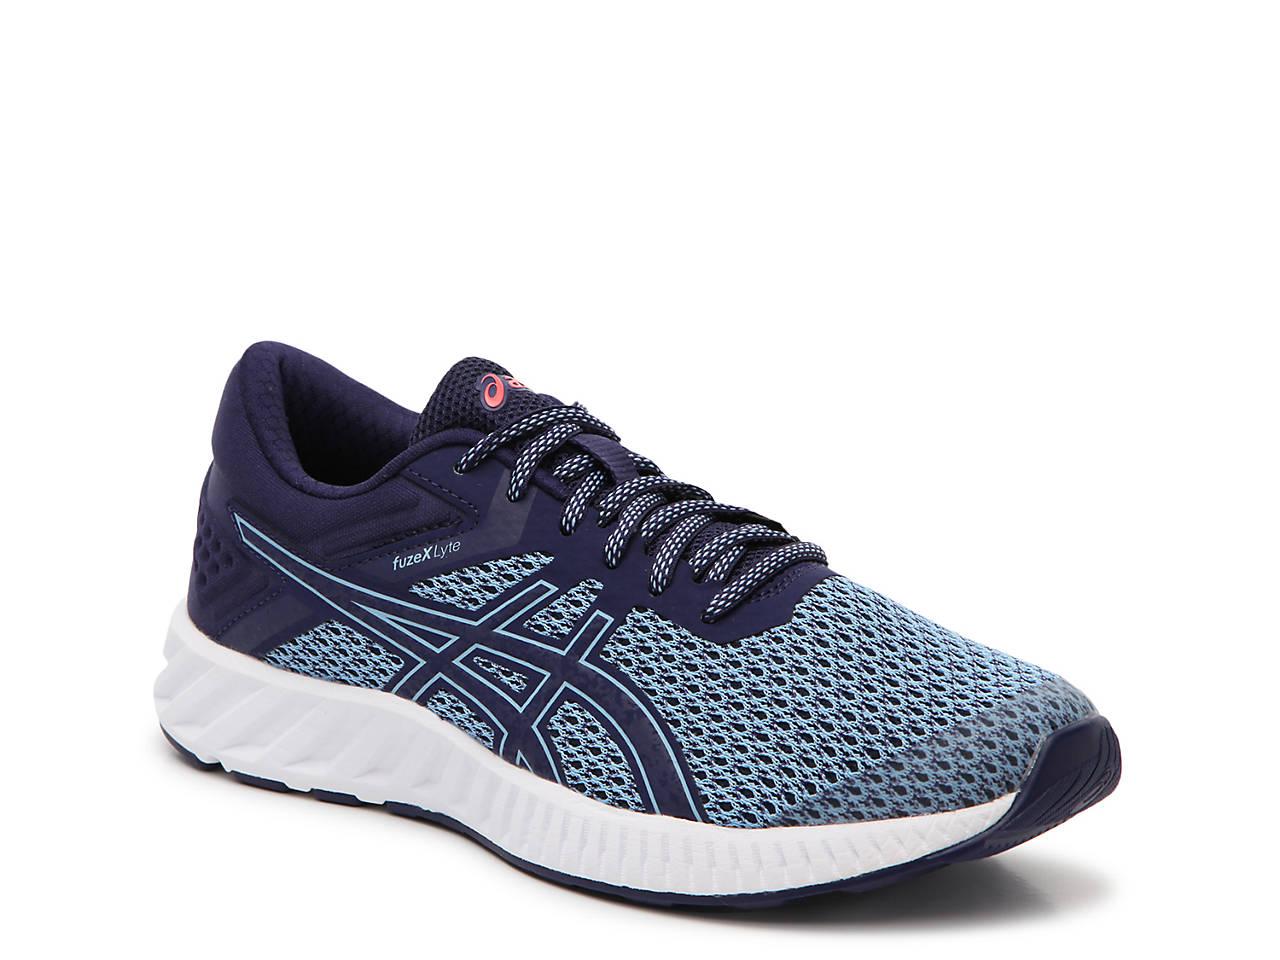 info for 0caf5 6cee6 ASICS. Fuzex Lyte 2 Lightweight Running Shoe - Women s